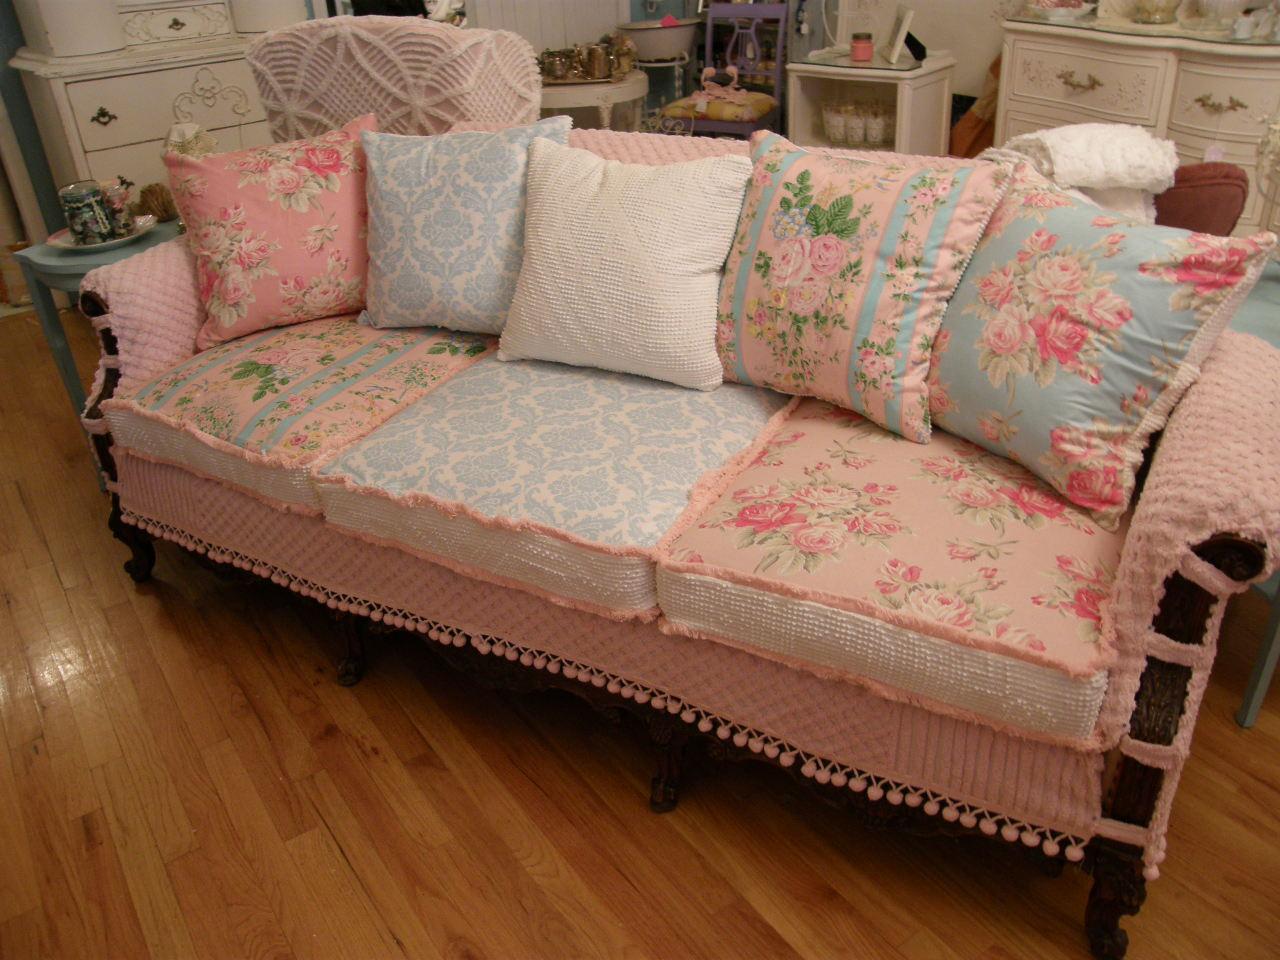 Vintage Chic Furniture Schenectady NY: my vintage chenille